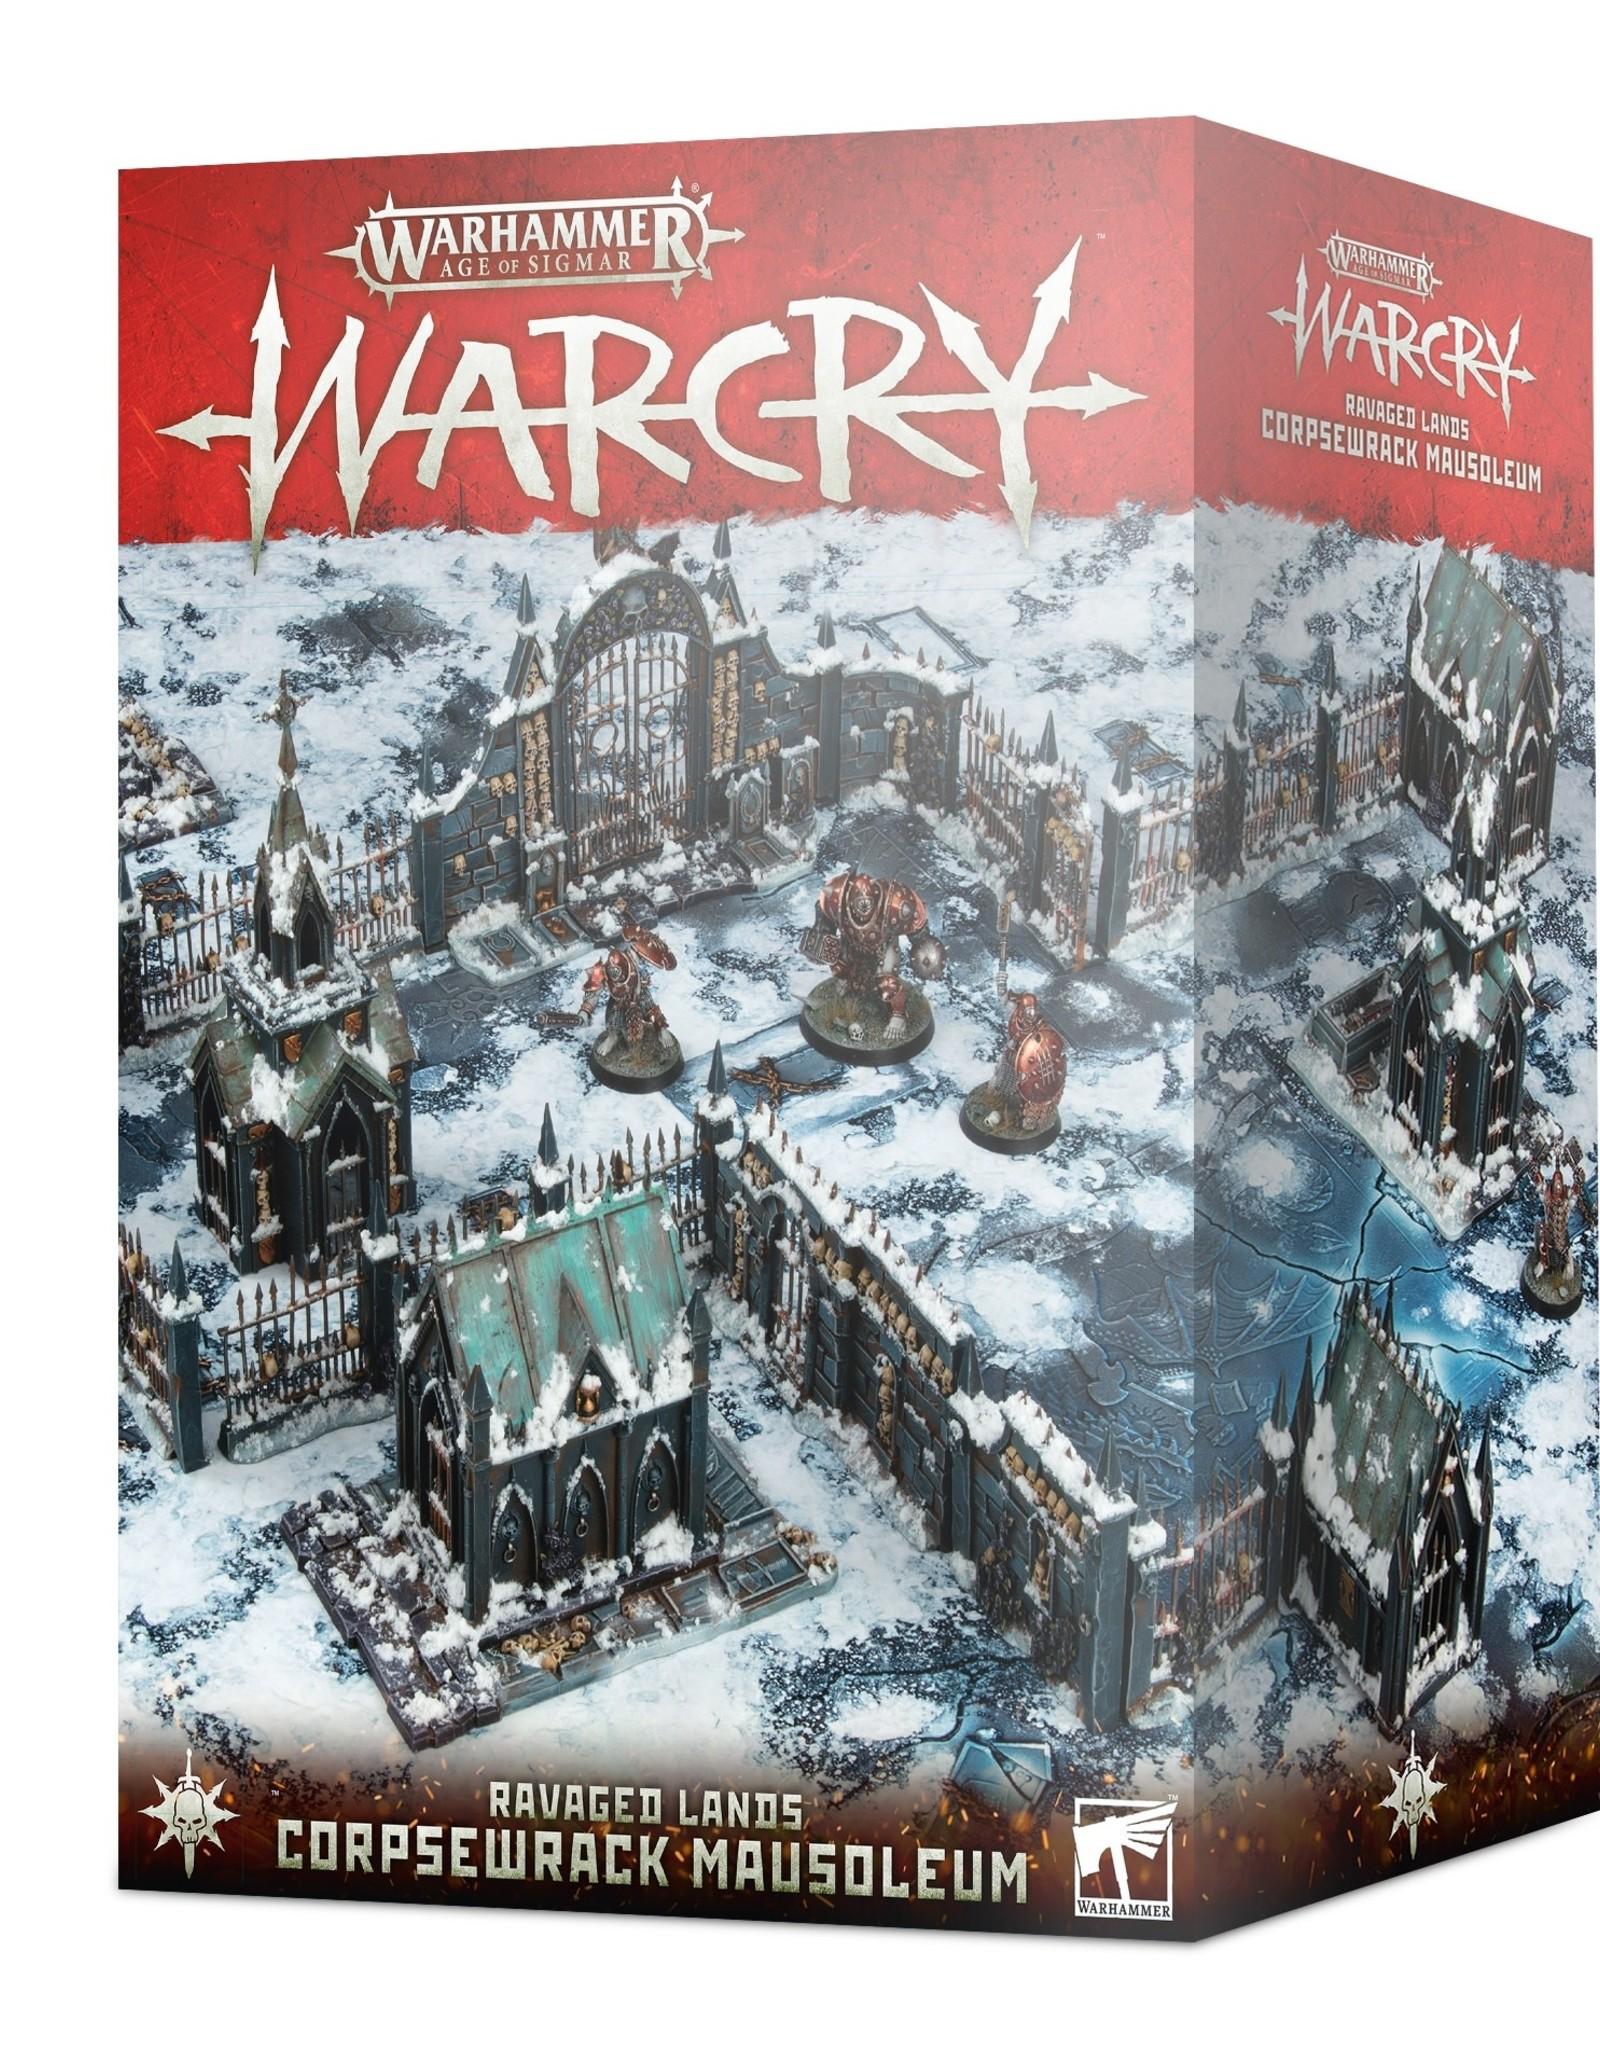 WarCry Warcry Ravaged Lands: Corpsewrack Mausoleum